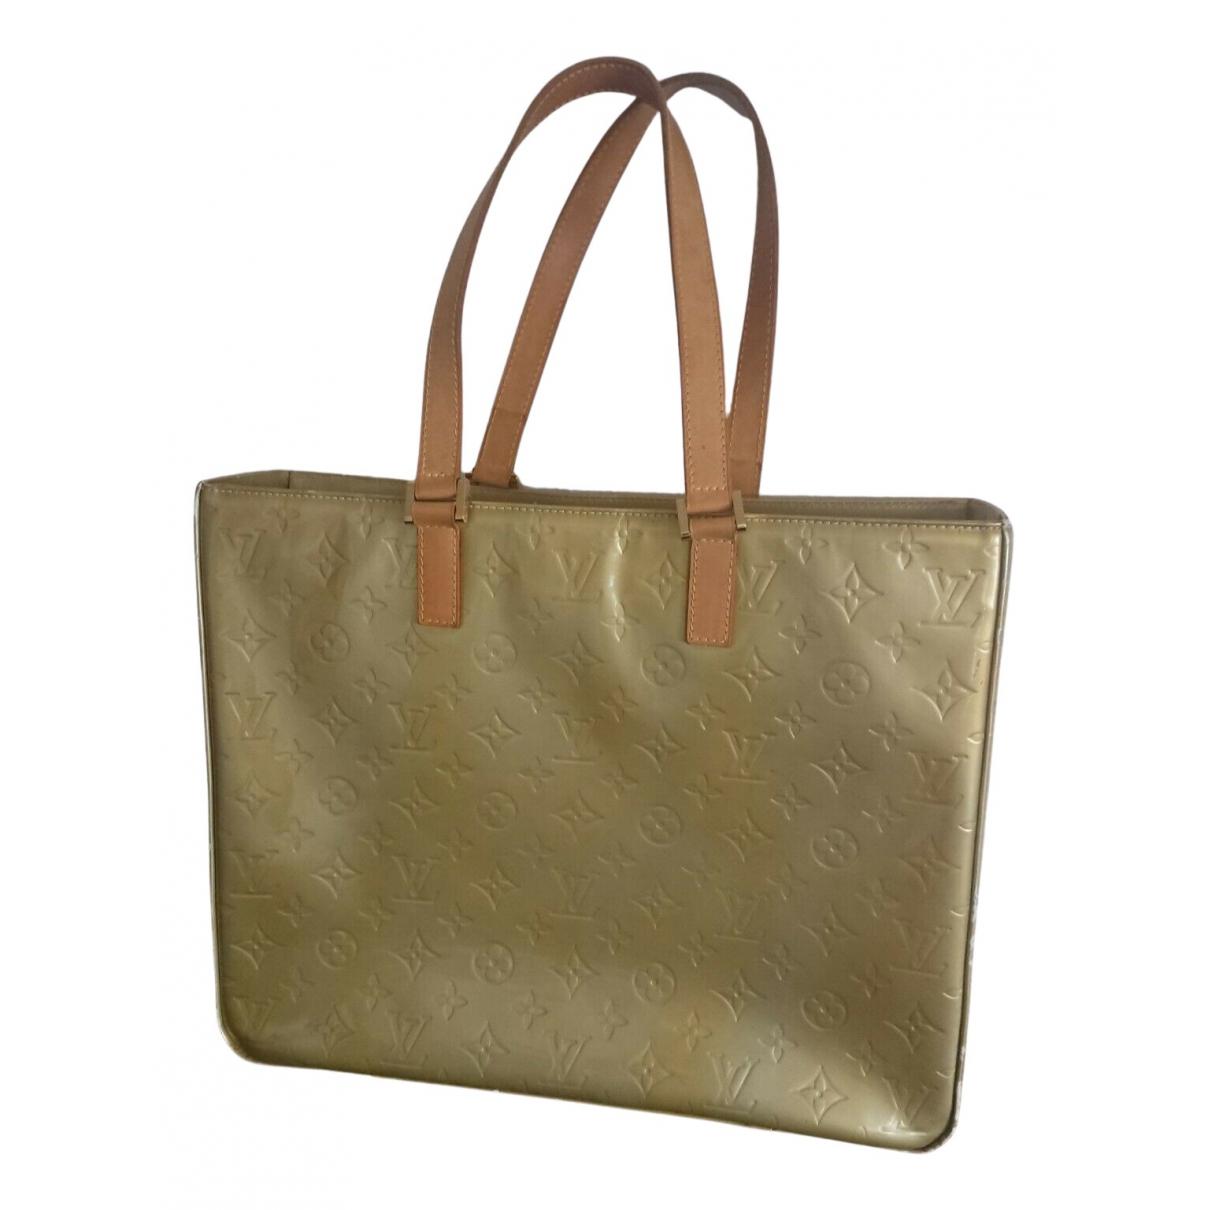 Louis Vuitton Columbus Beige Patent leather handbag for Women N